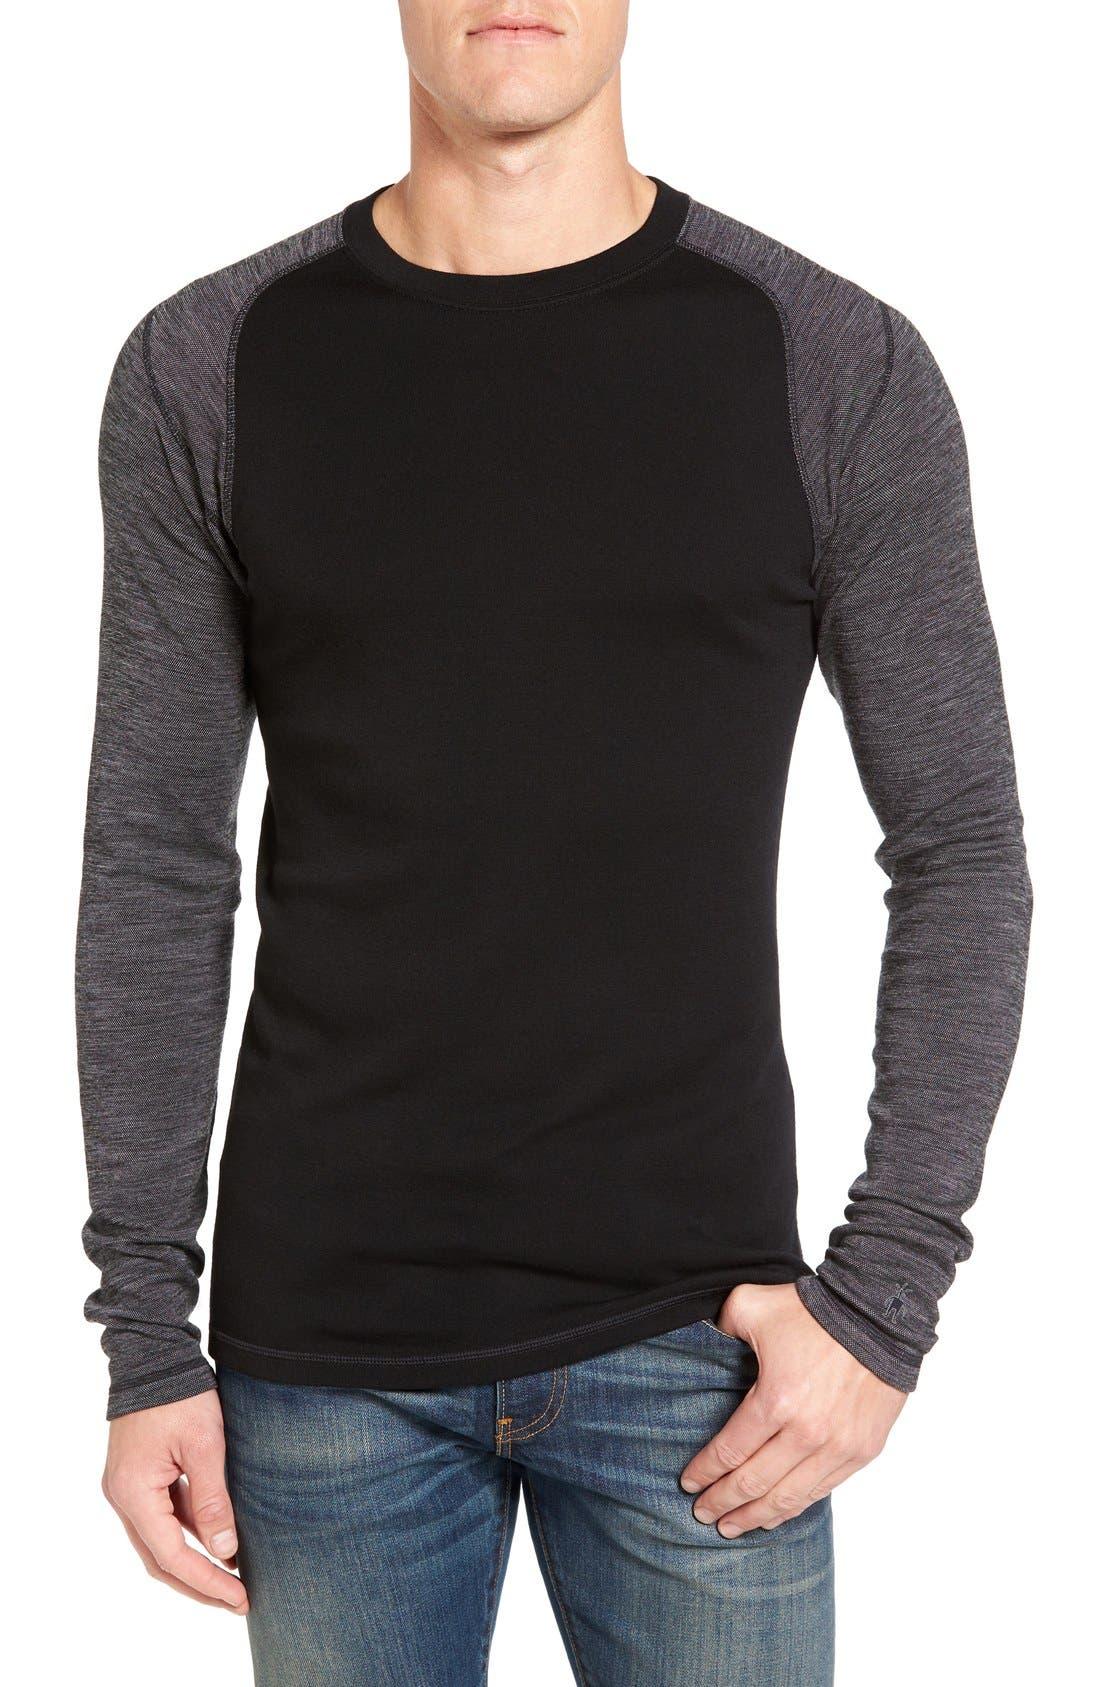 Merino 250 Base Layer Pattern Crewneck T-Shirt,                         Main,                         color, Black/ Light Gray